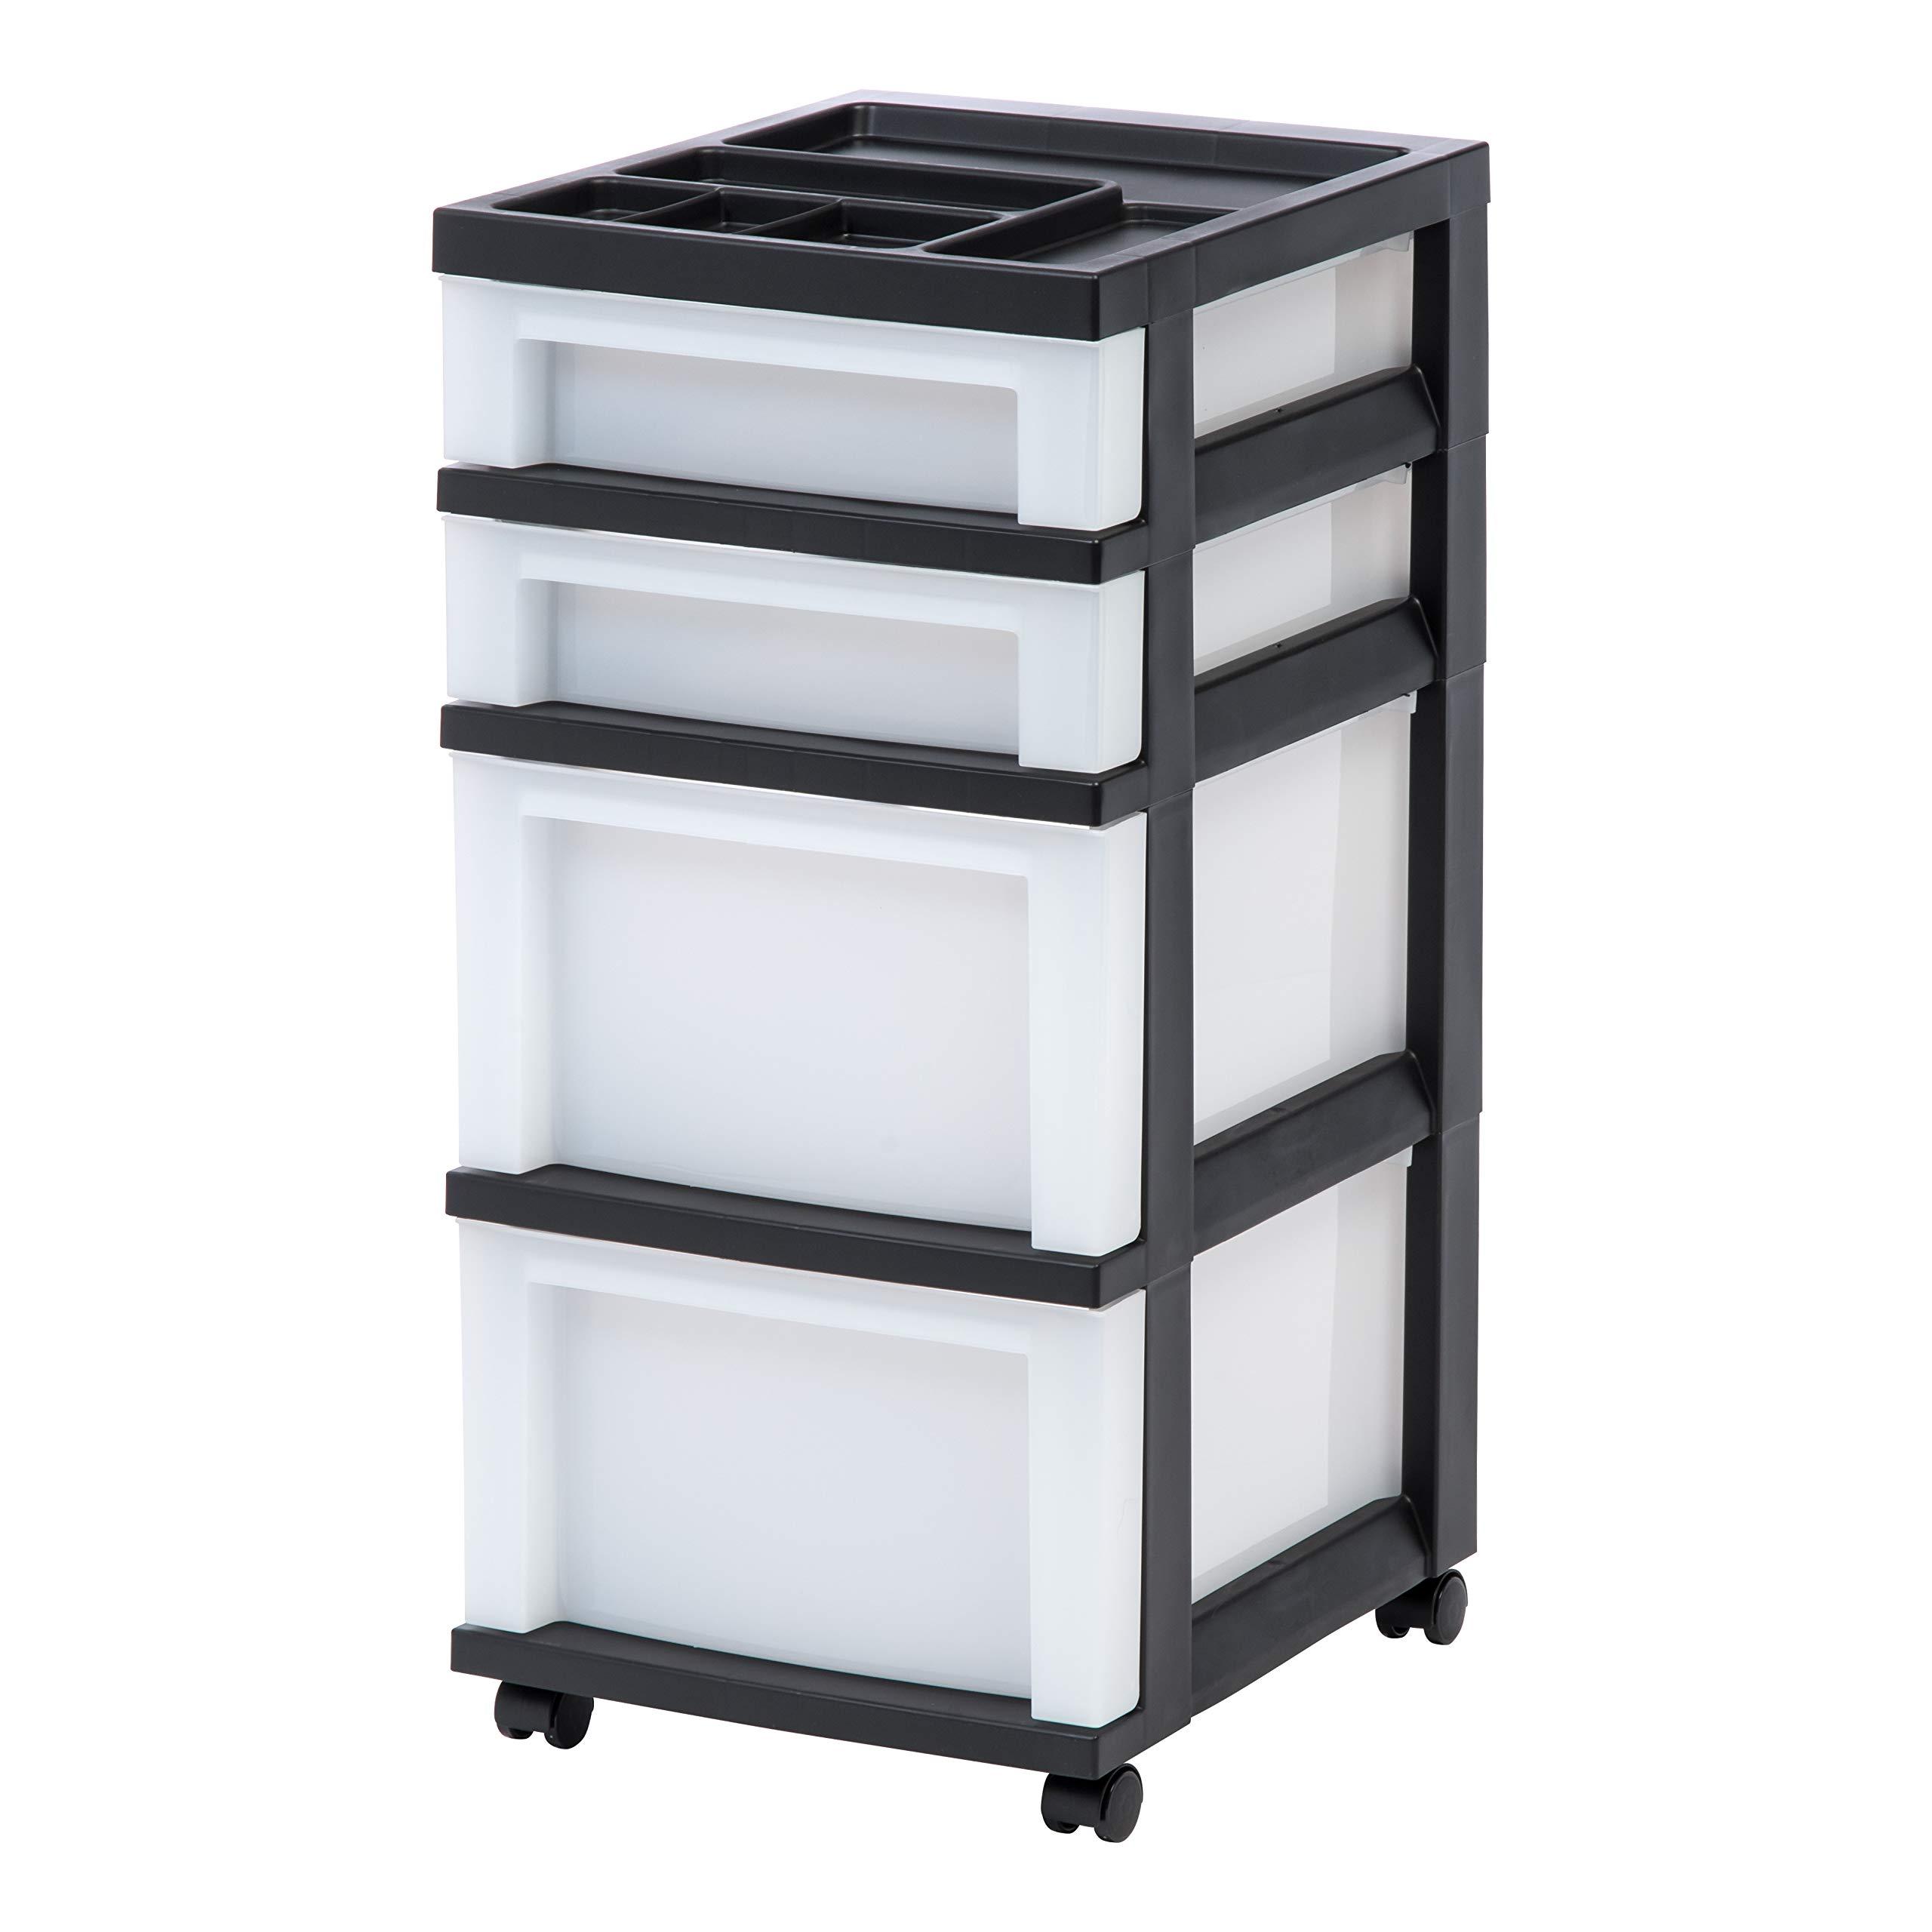 IRIS USA, Inc. MC-322-TOP 4-Drawer Storage Rolling Cart with Organizer Top, Black/Pearl by IRIS USA, Inc.